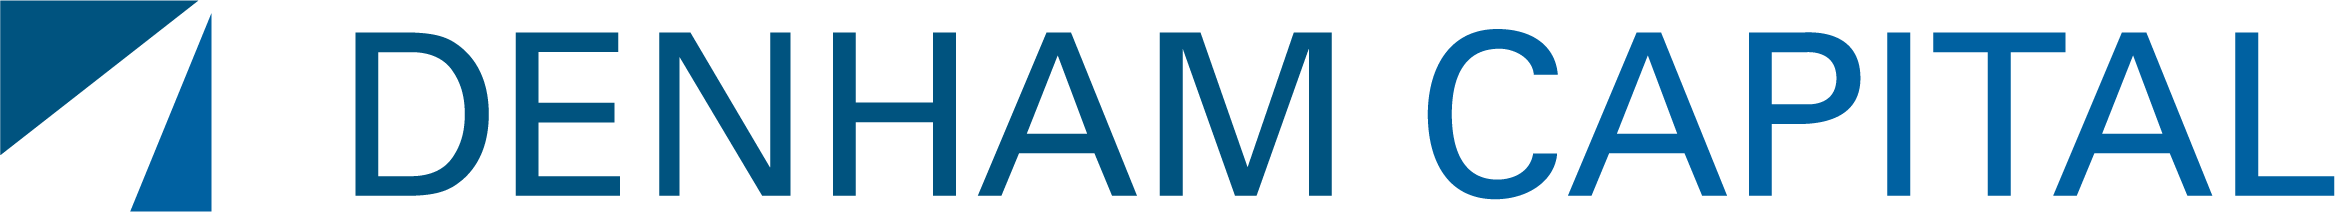 Denham_Color_Print_Logo.png